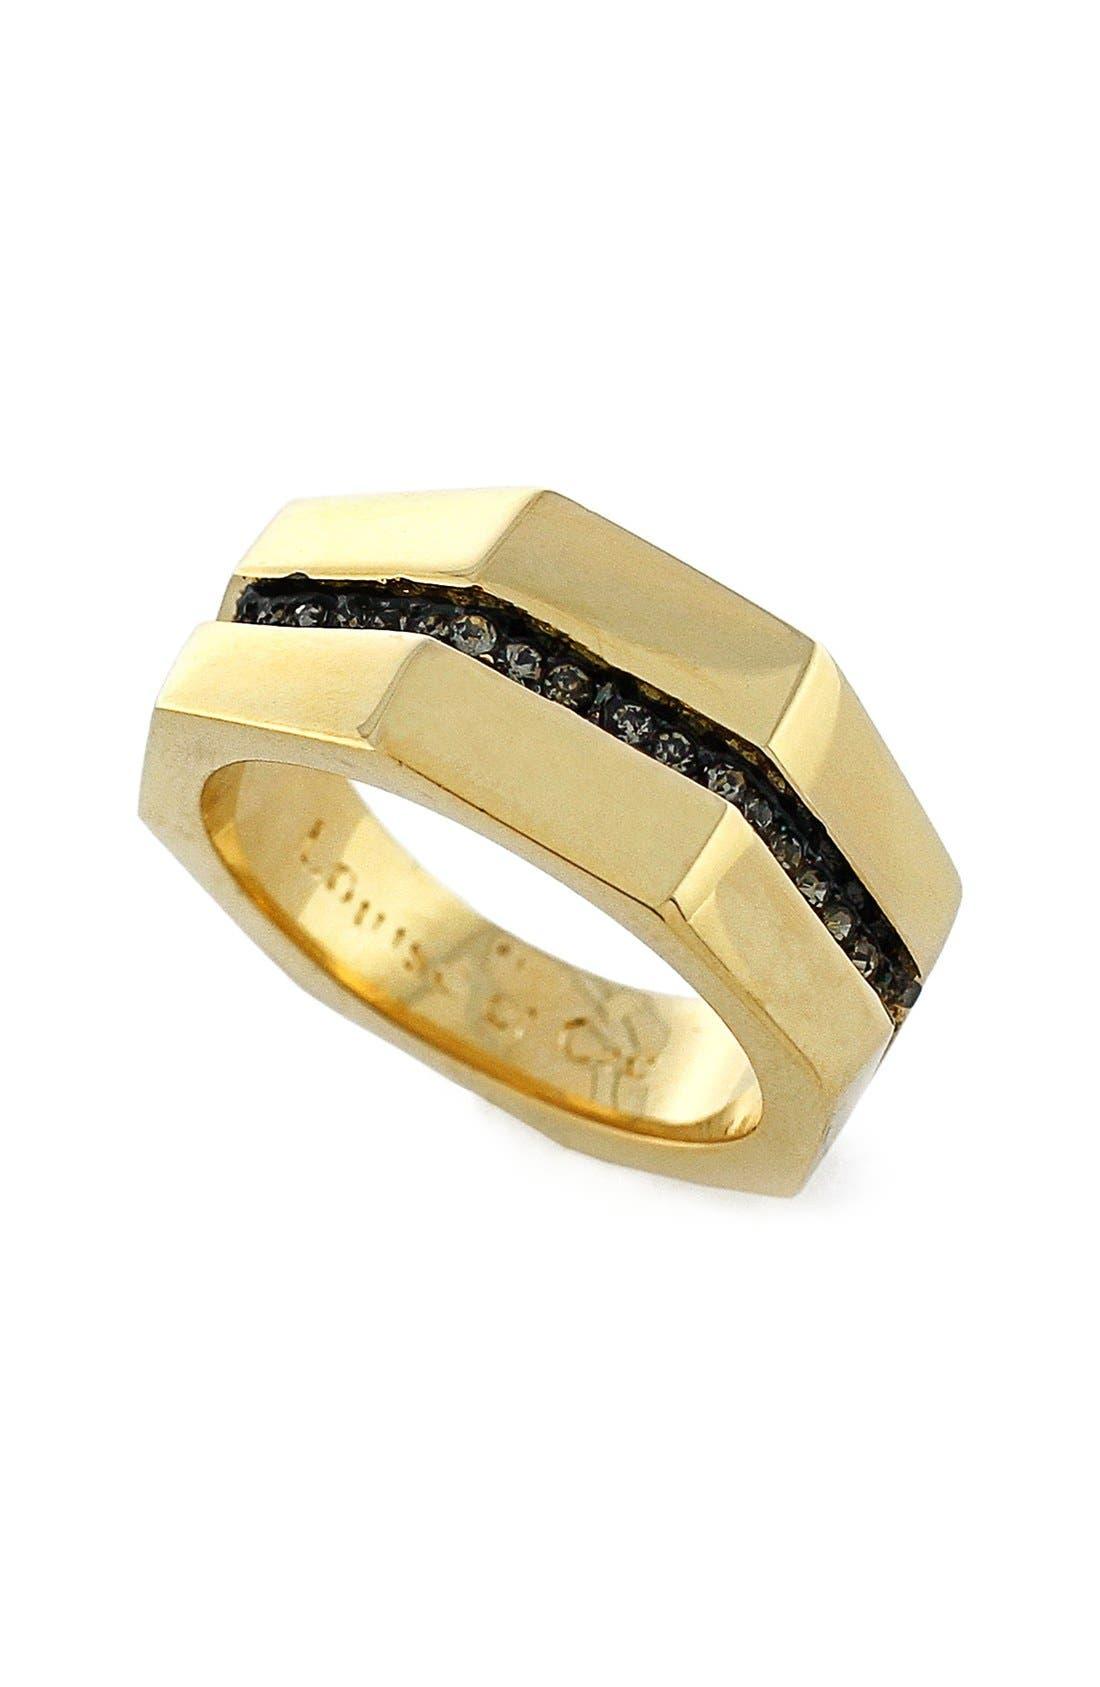 Alternate Image 1 Selected - Louise et Cie'Kammenstrat'Split PavéBand Ring